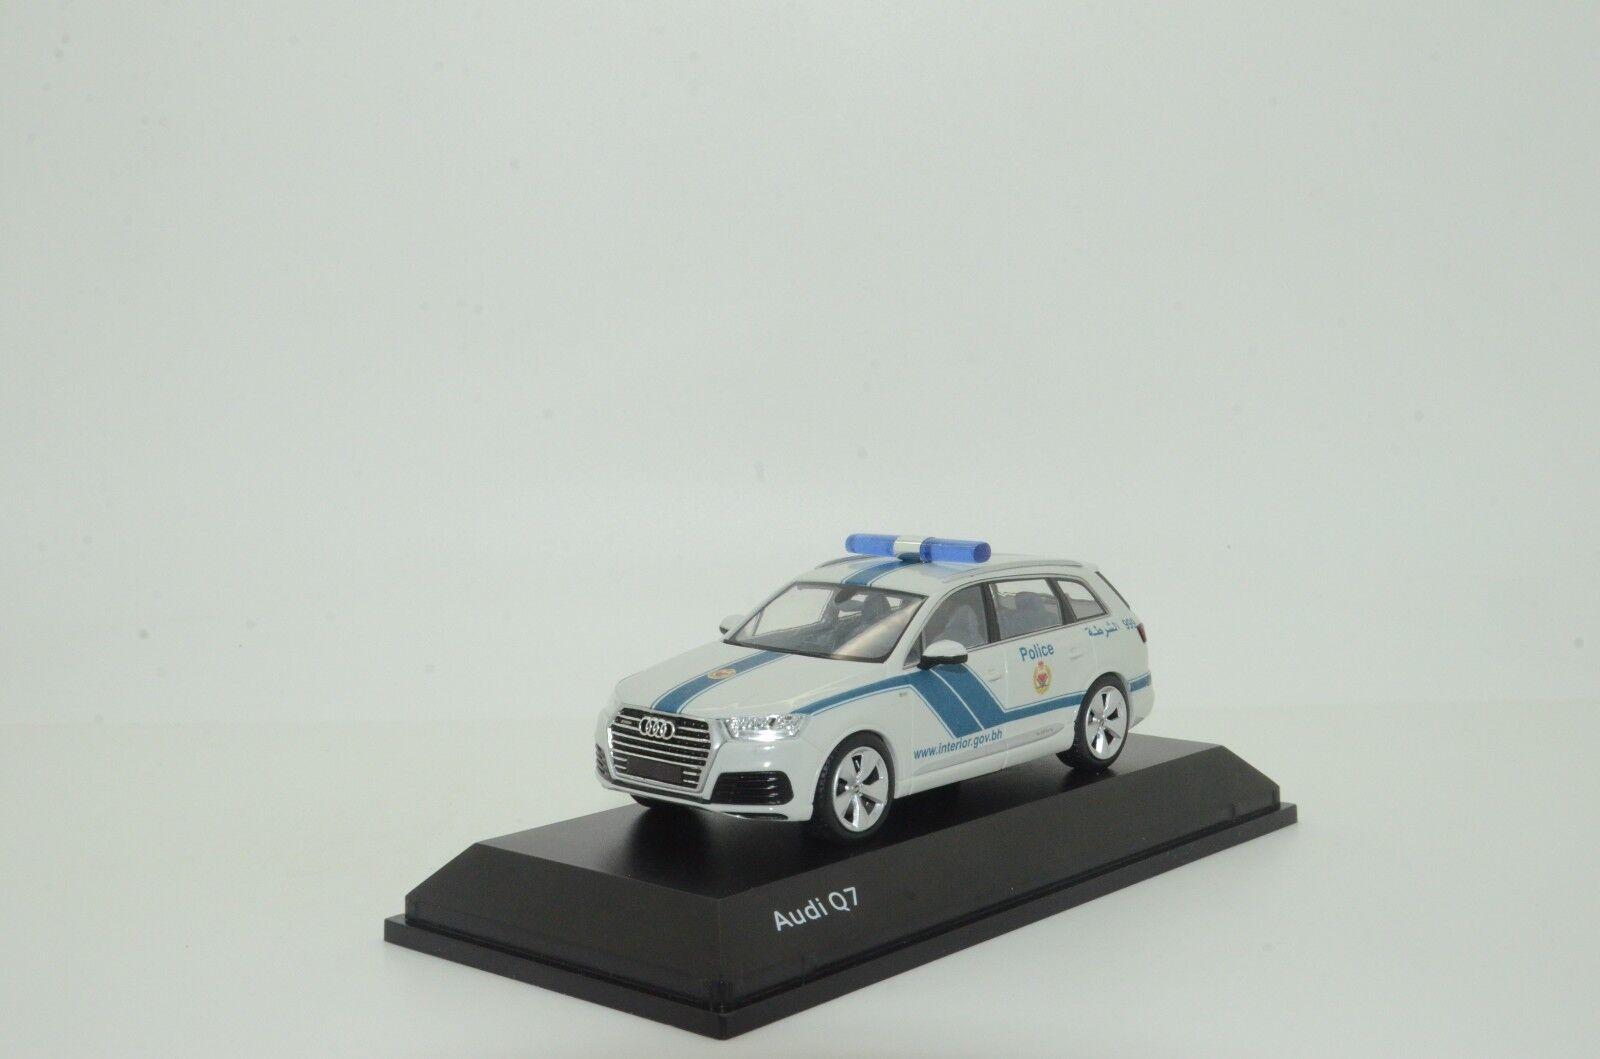 Raro nuevo Audi Q7 Bahrein policía Hecho a Medida 1/43